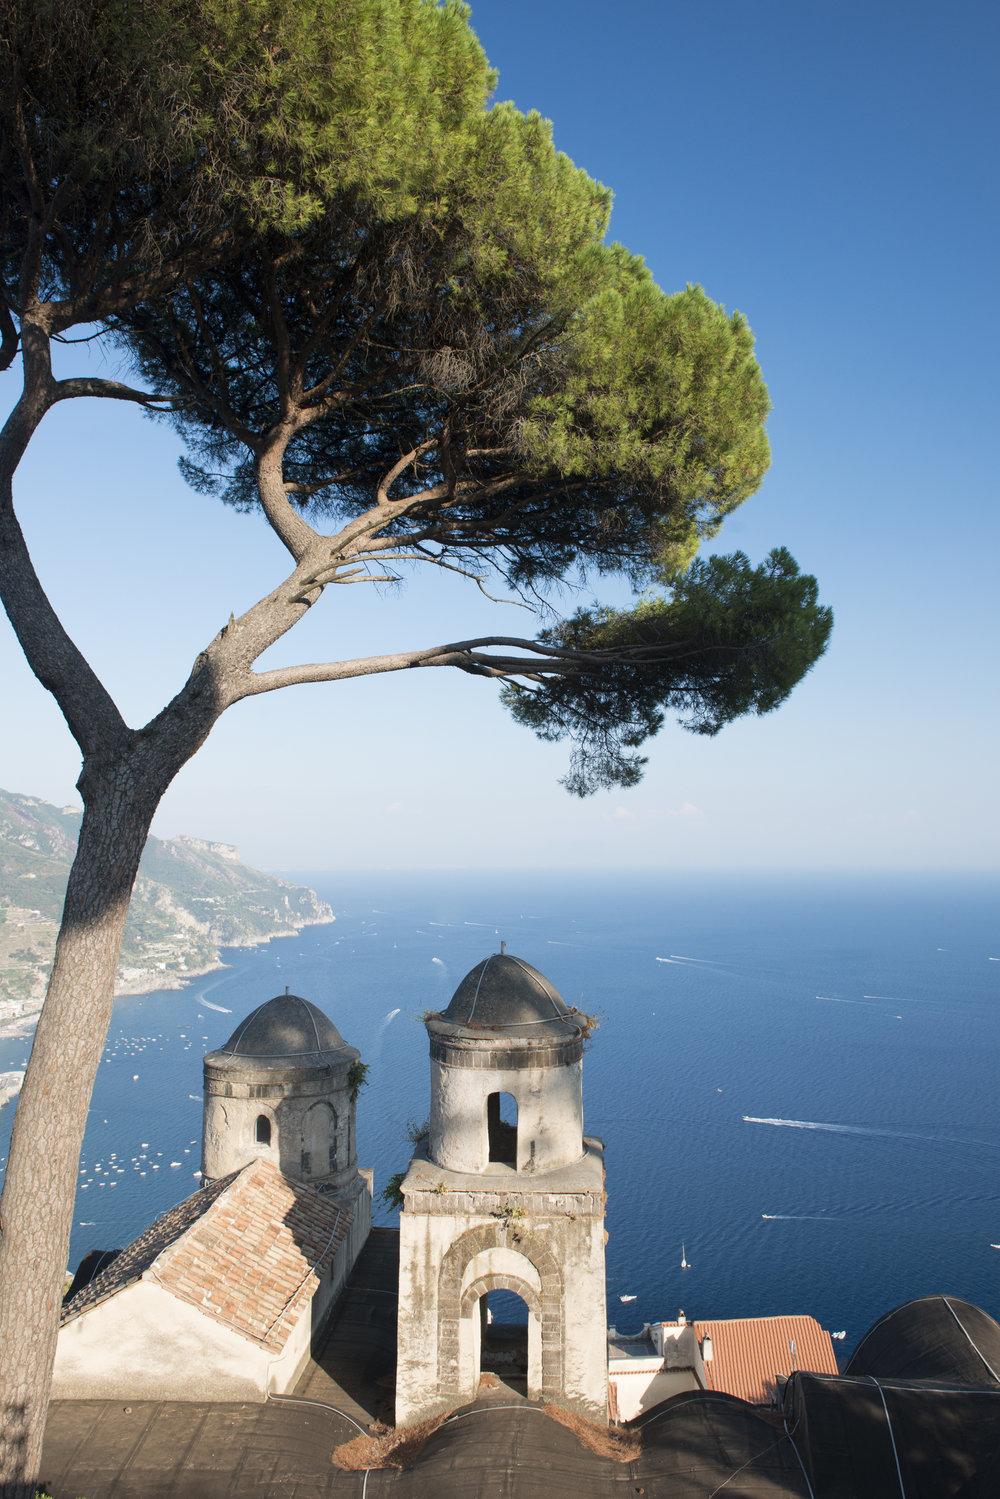 Naples_Ravello-14_Italy_Jo_Hunt_Photography.jpg